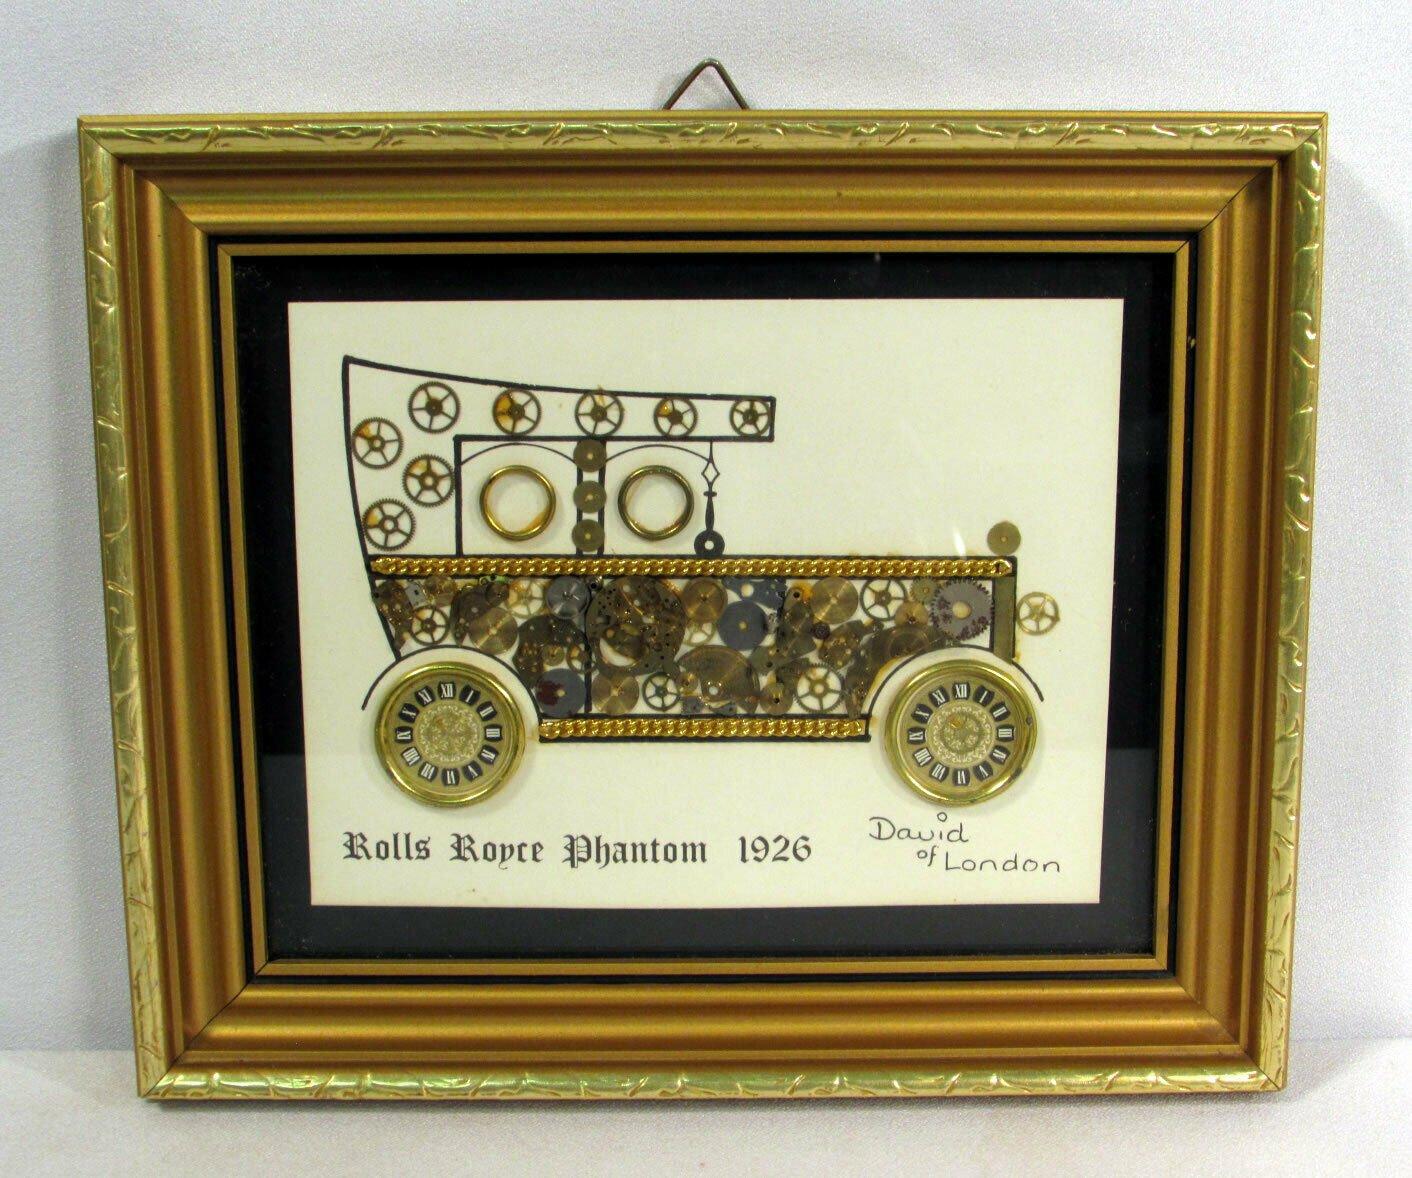 Rolls Royce Phantom 1926 David of London Horological Montage Watch Parts Framed